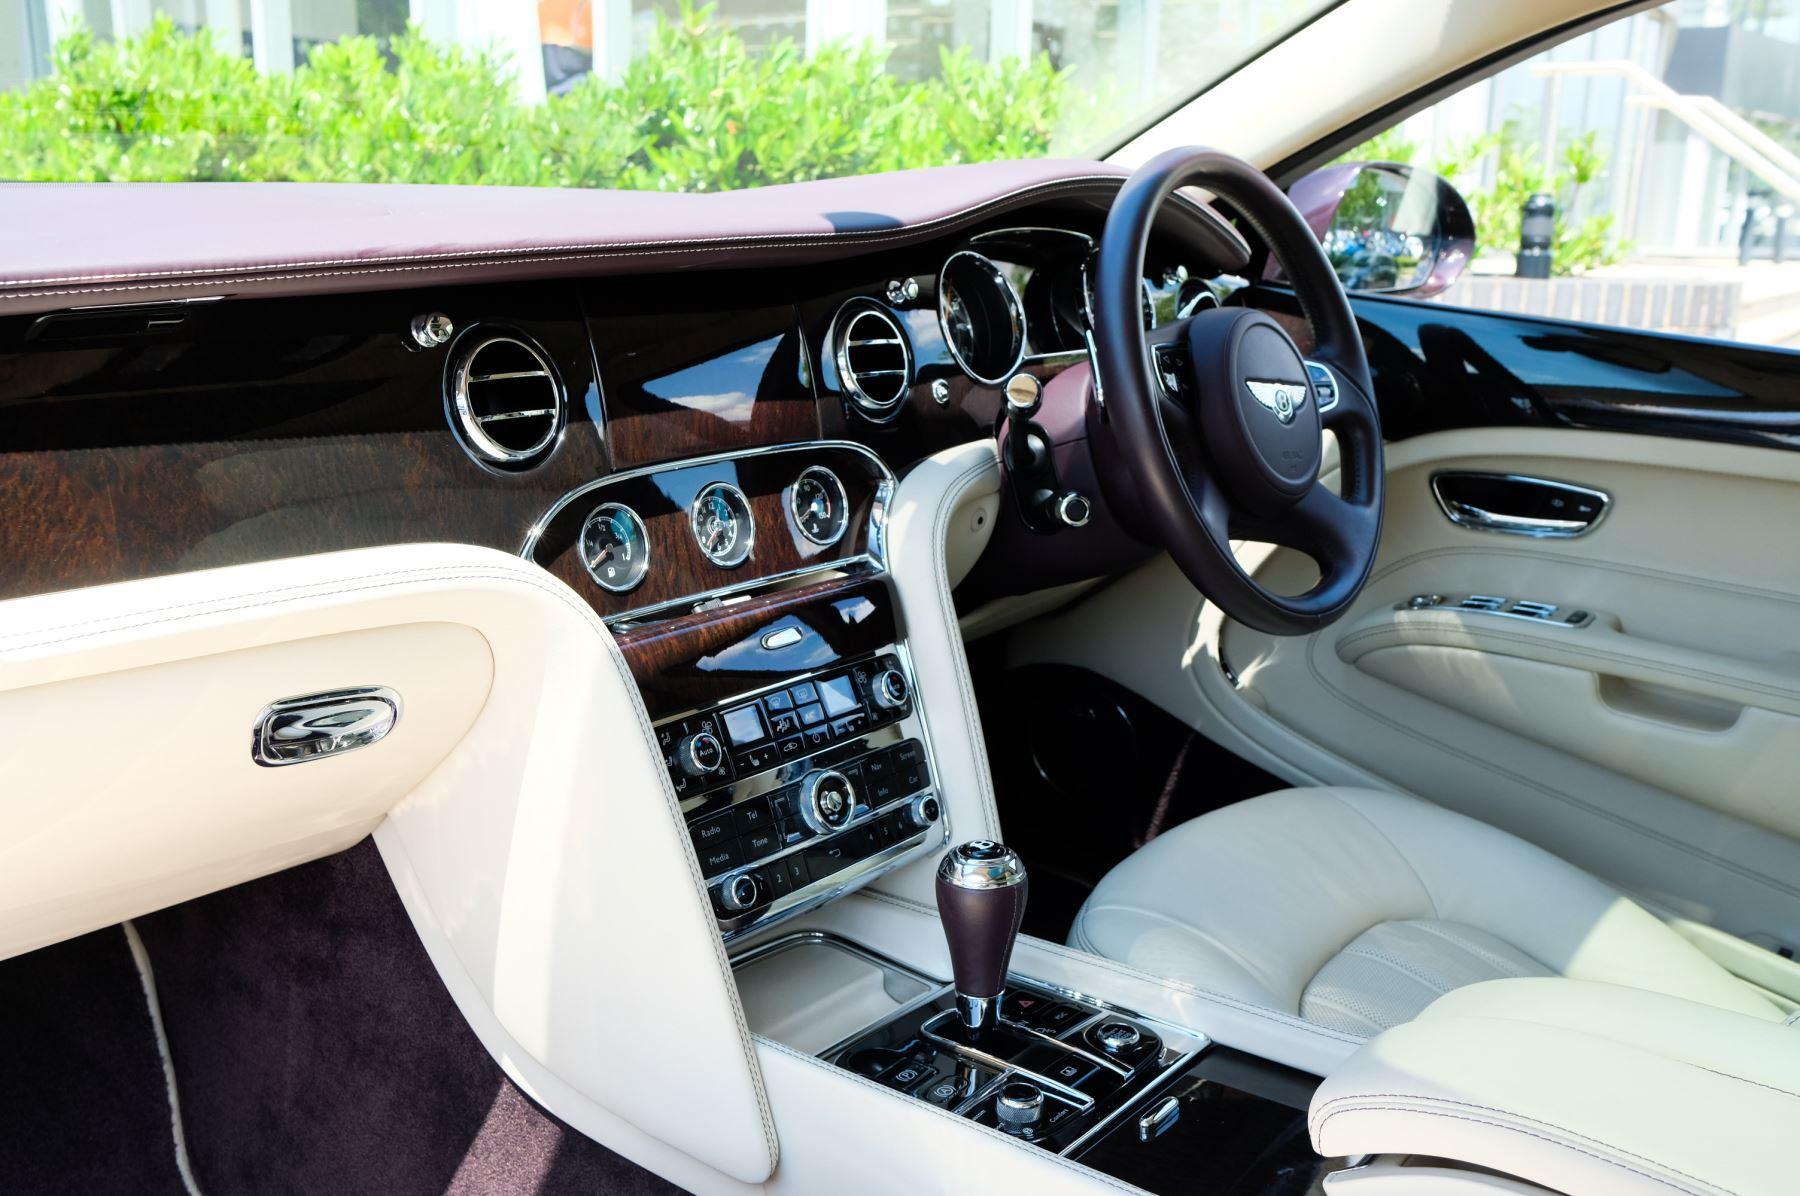 Bentley Mulsanne 6.8 V8 - Comfort, Entertainment and Premier Specification image 10